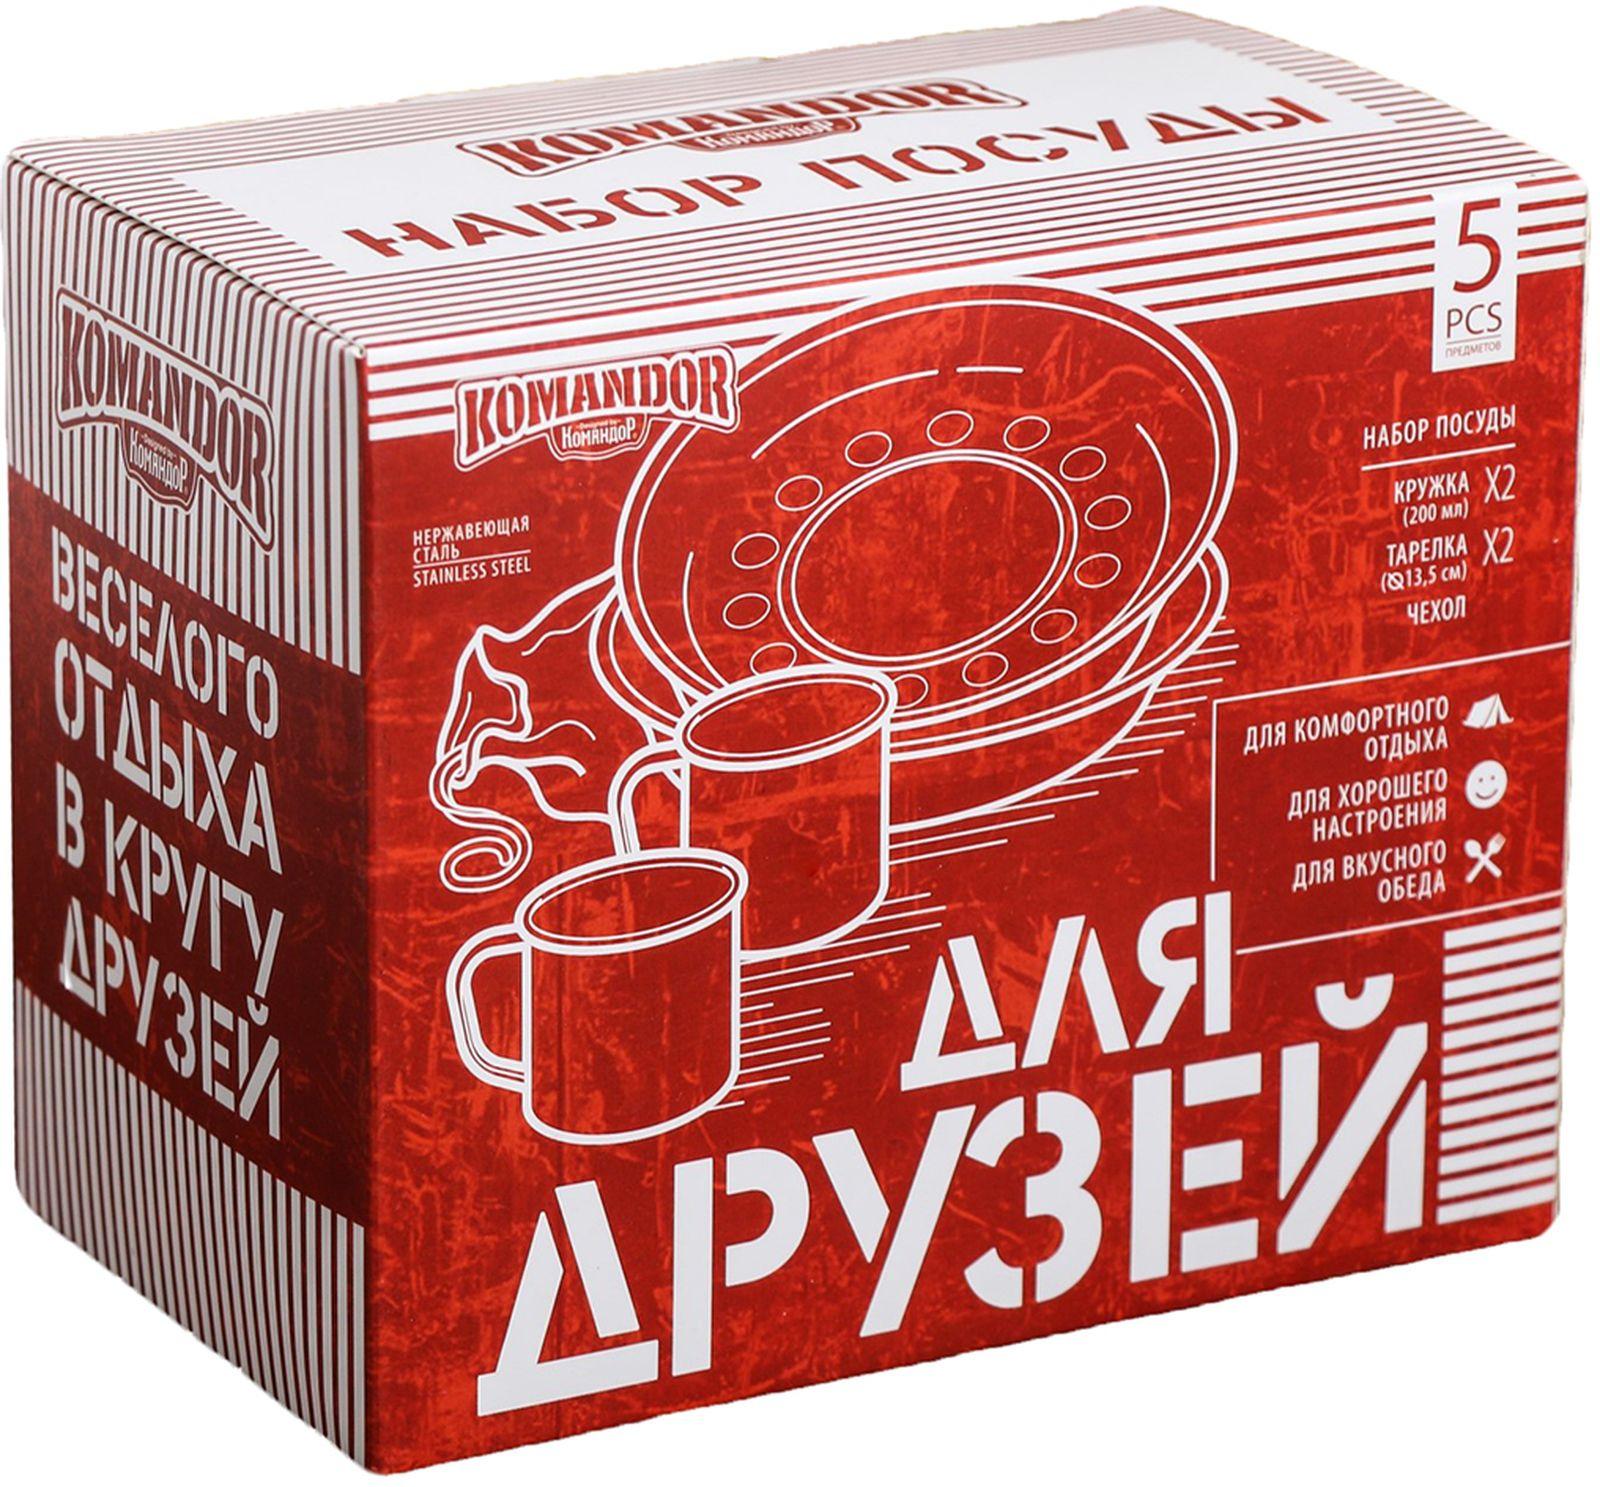 Nabor-pohodnoj-posudy-Komandor-Dlya-druzej-3656863-5-predmetov-154448801